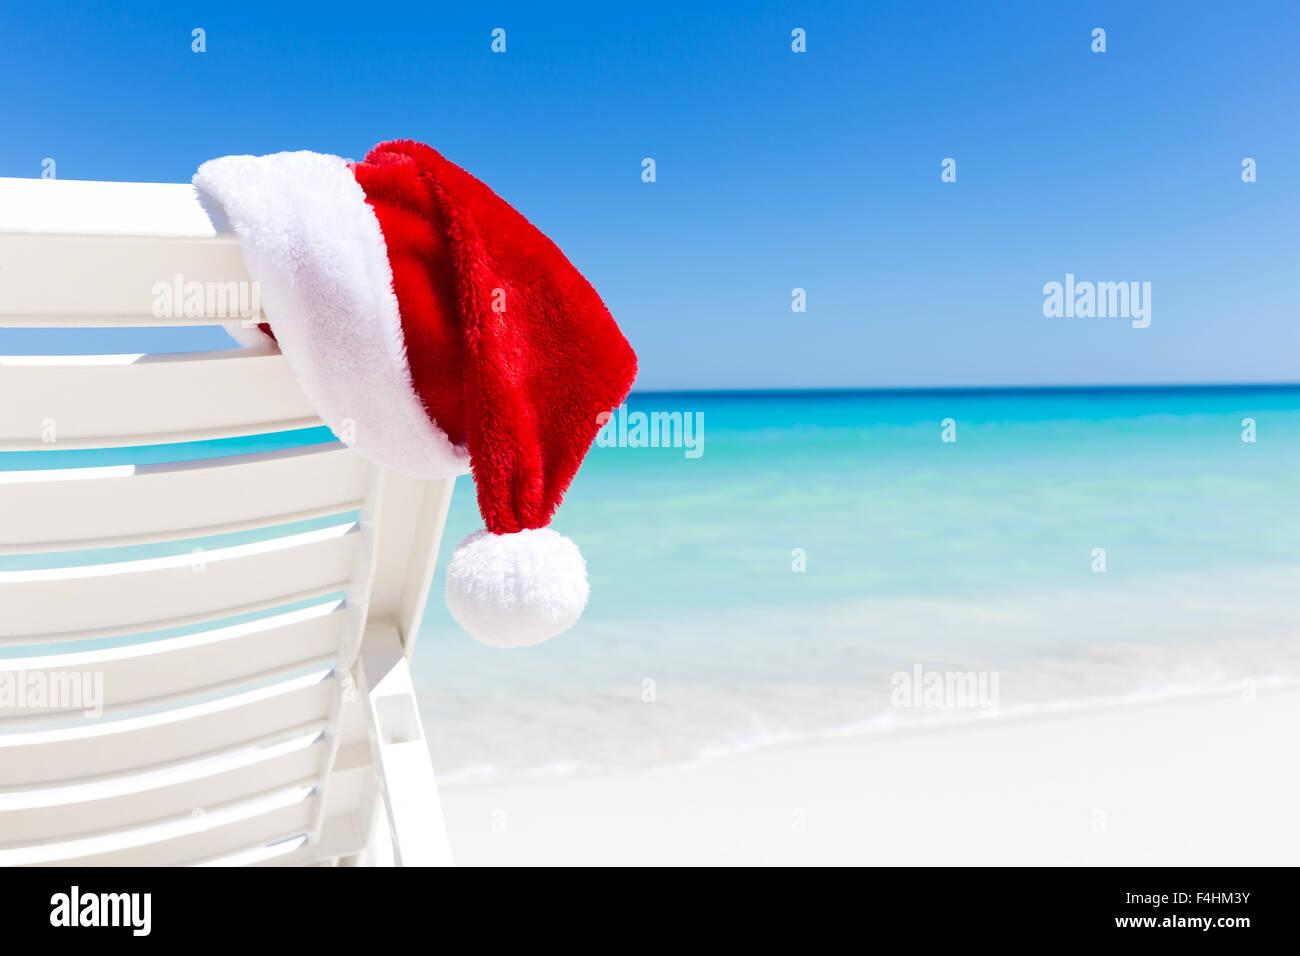 Santa Claus Hat on sunbed near sandy beach with turquoise caribbean ...